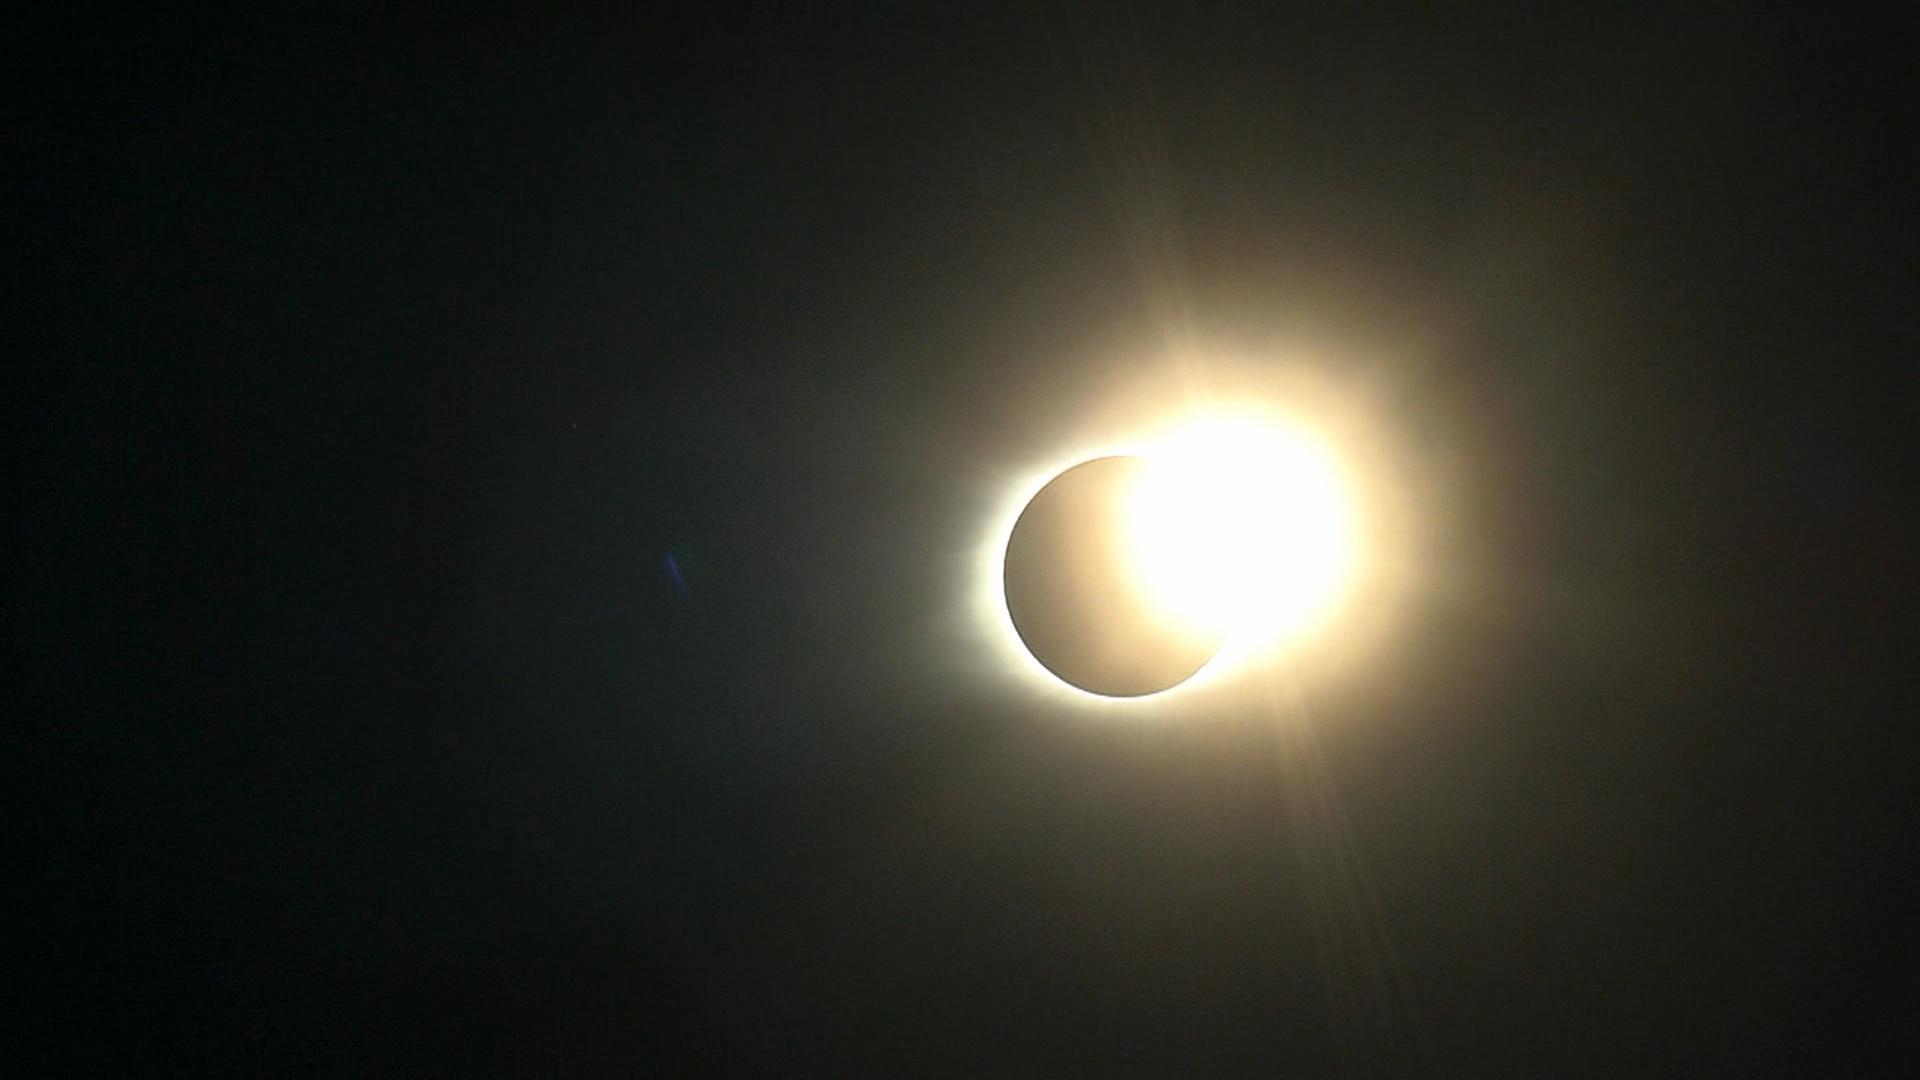 Pbs Kids Eclipse Show